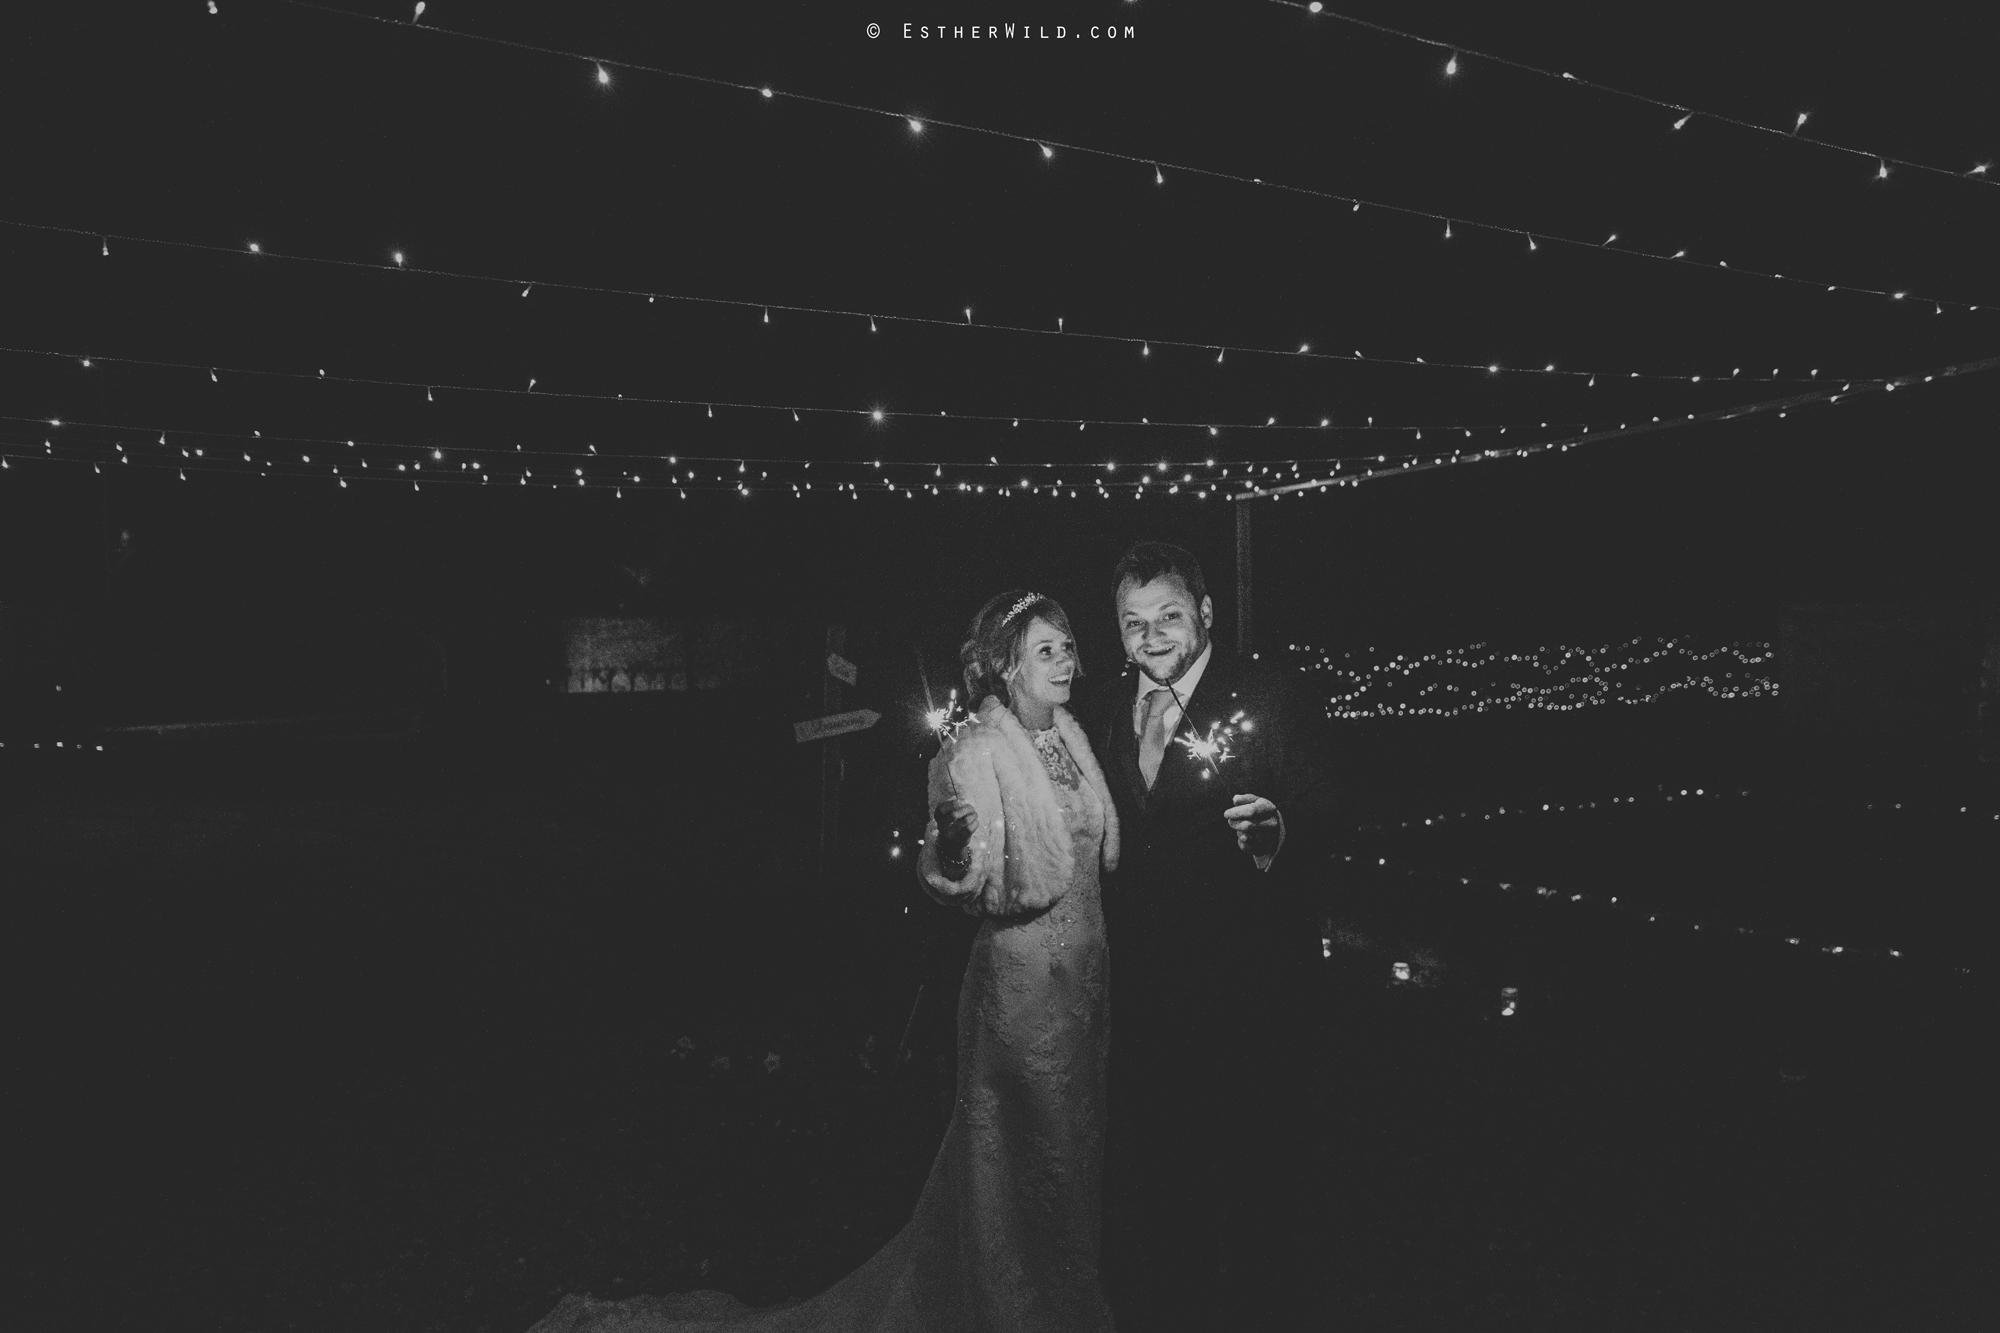 Wedding_Photography_Diss_Gawdy_Hall_Redenhall_Church_Norfolk_Winter_Esther_Wild_Copyright_IMG_2342.jpg